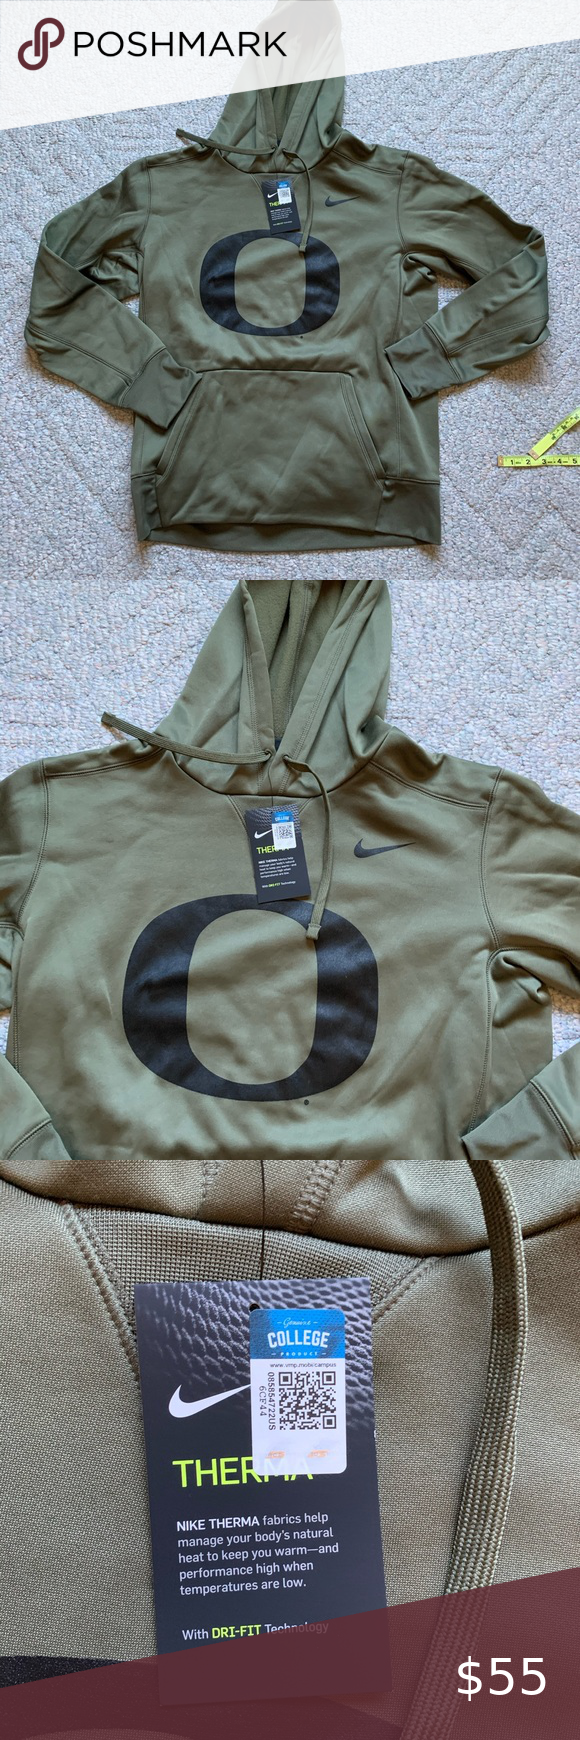 Nike Oregon Ducks Therma Hoodie Sweatshirt Sweatshirts Hoodie Branded Sweatshirts Hoodies [ 1740 x 580 Pixel ]